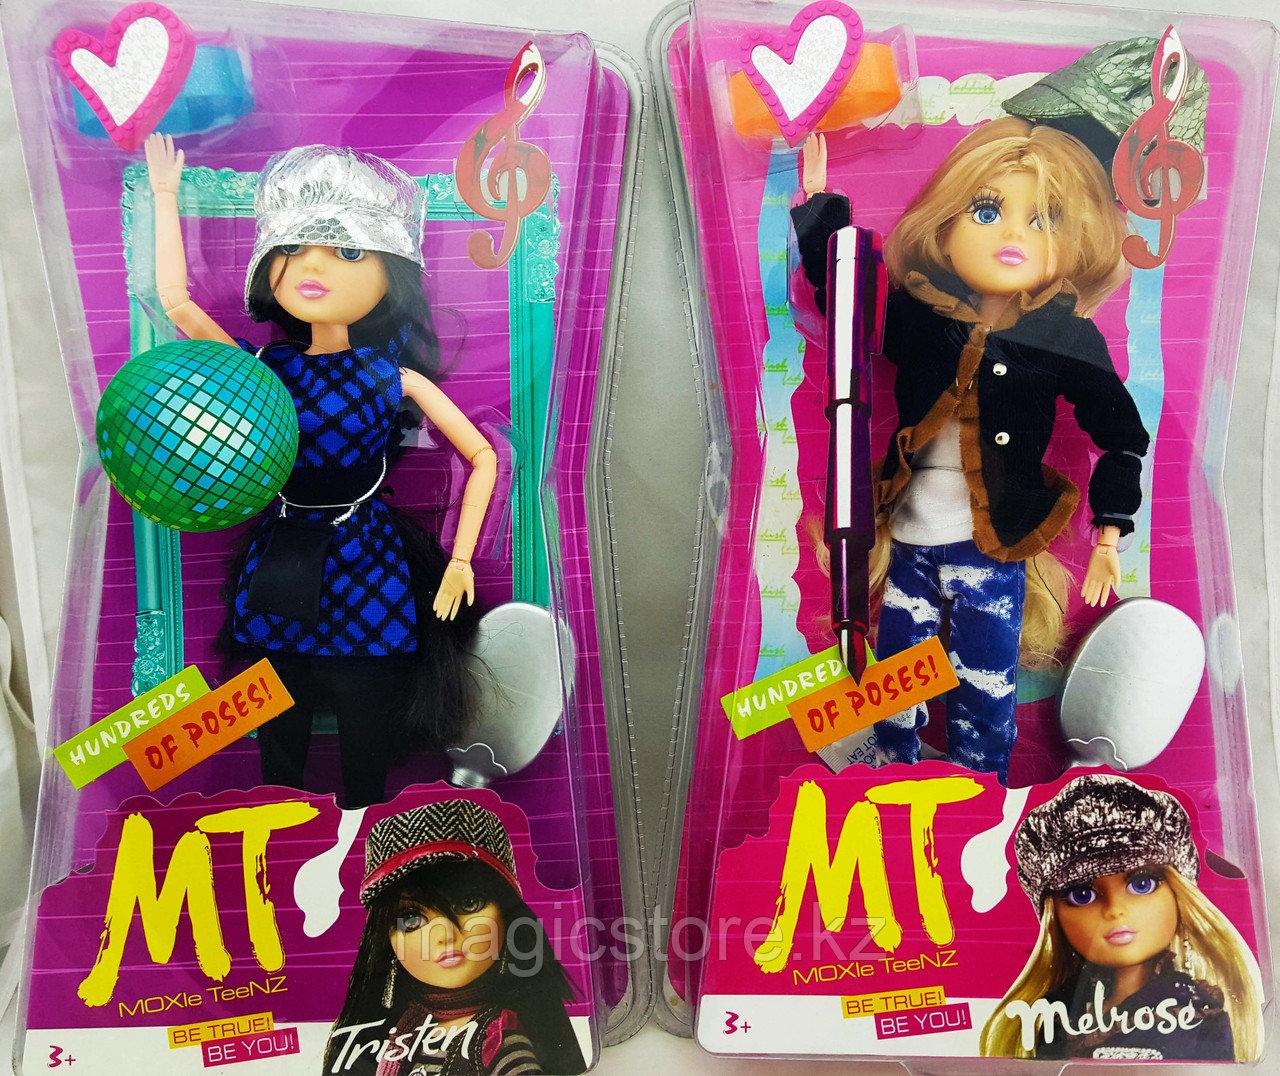 Кукла MT Moxie Teenz Hundreos of Poses (4 вида) - фото 2